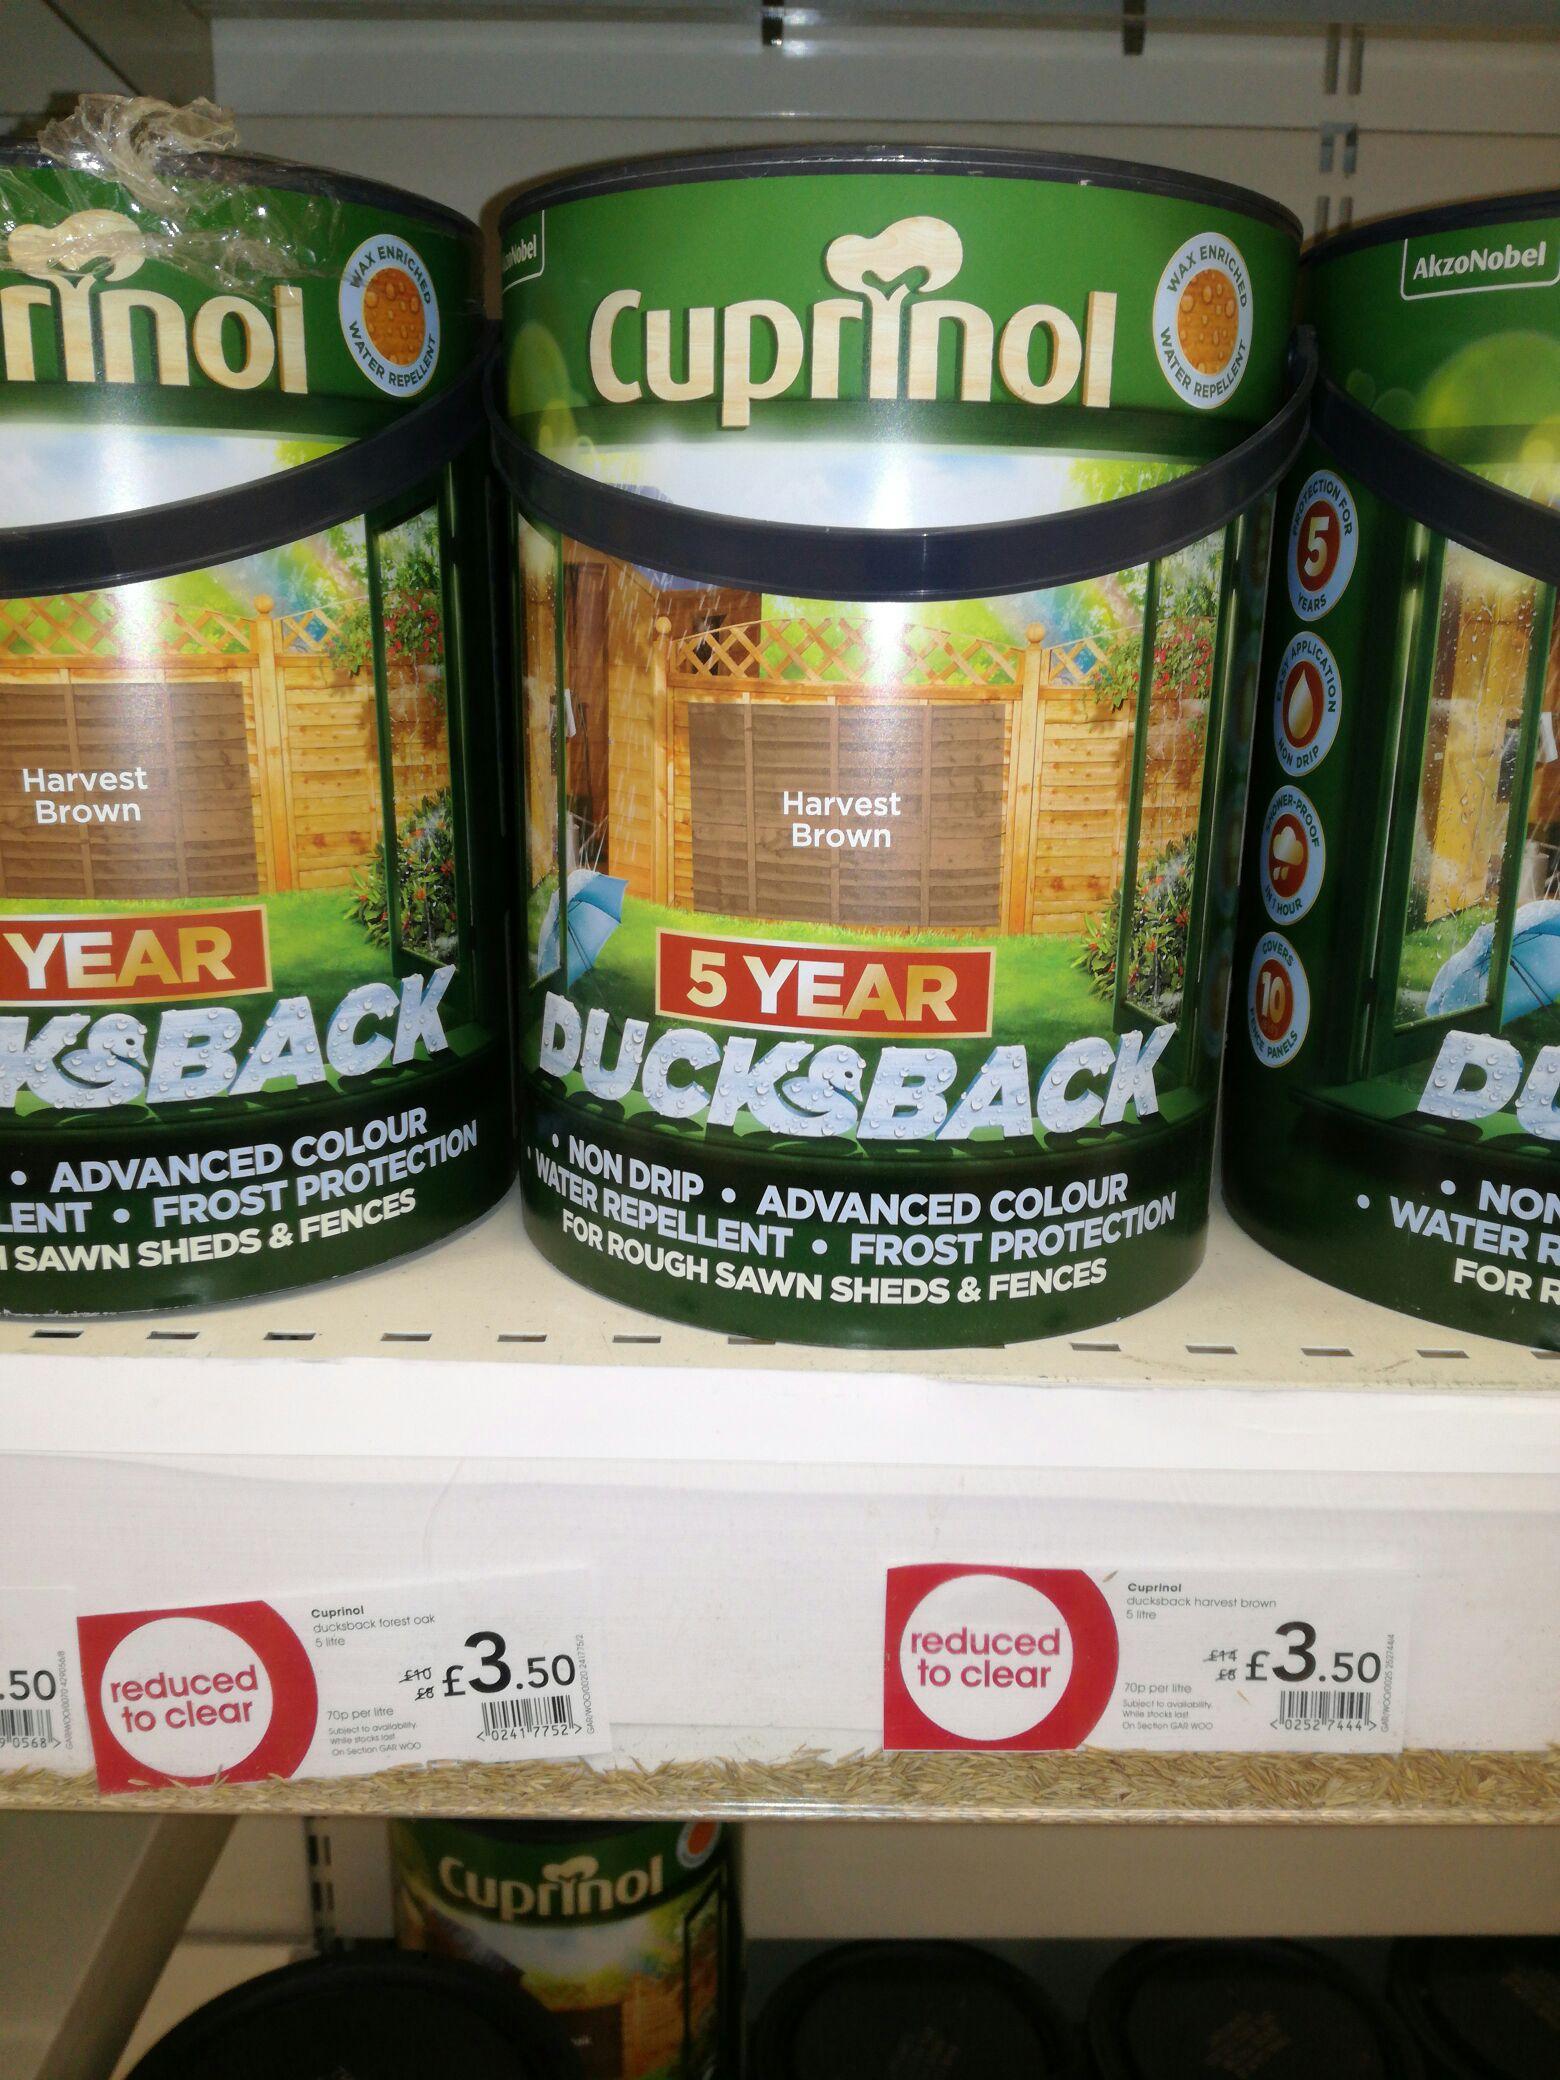 Cuprinol, Ducksback @ Wilko instore for £3.50